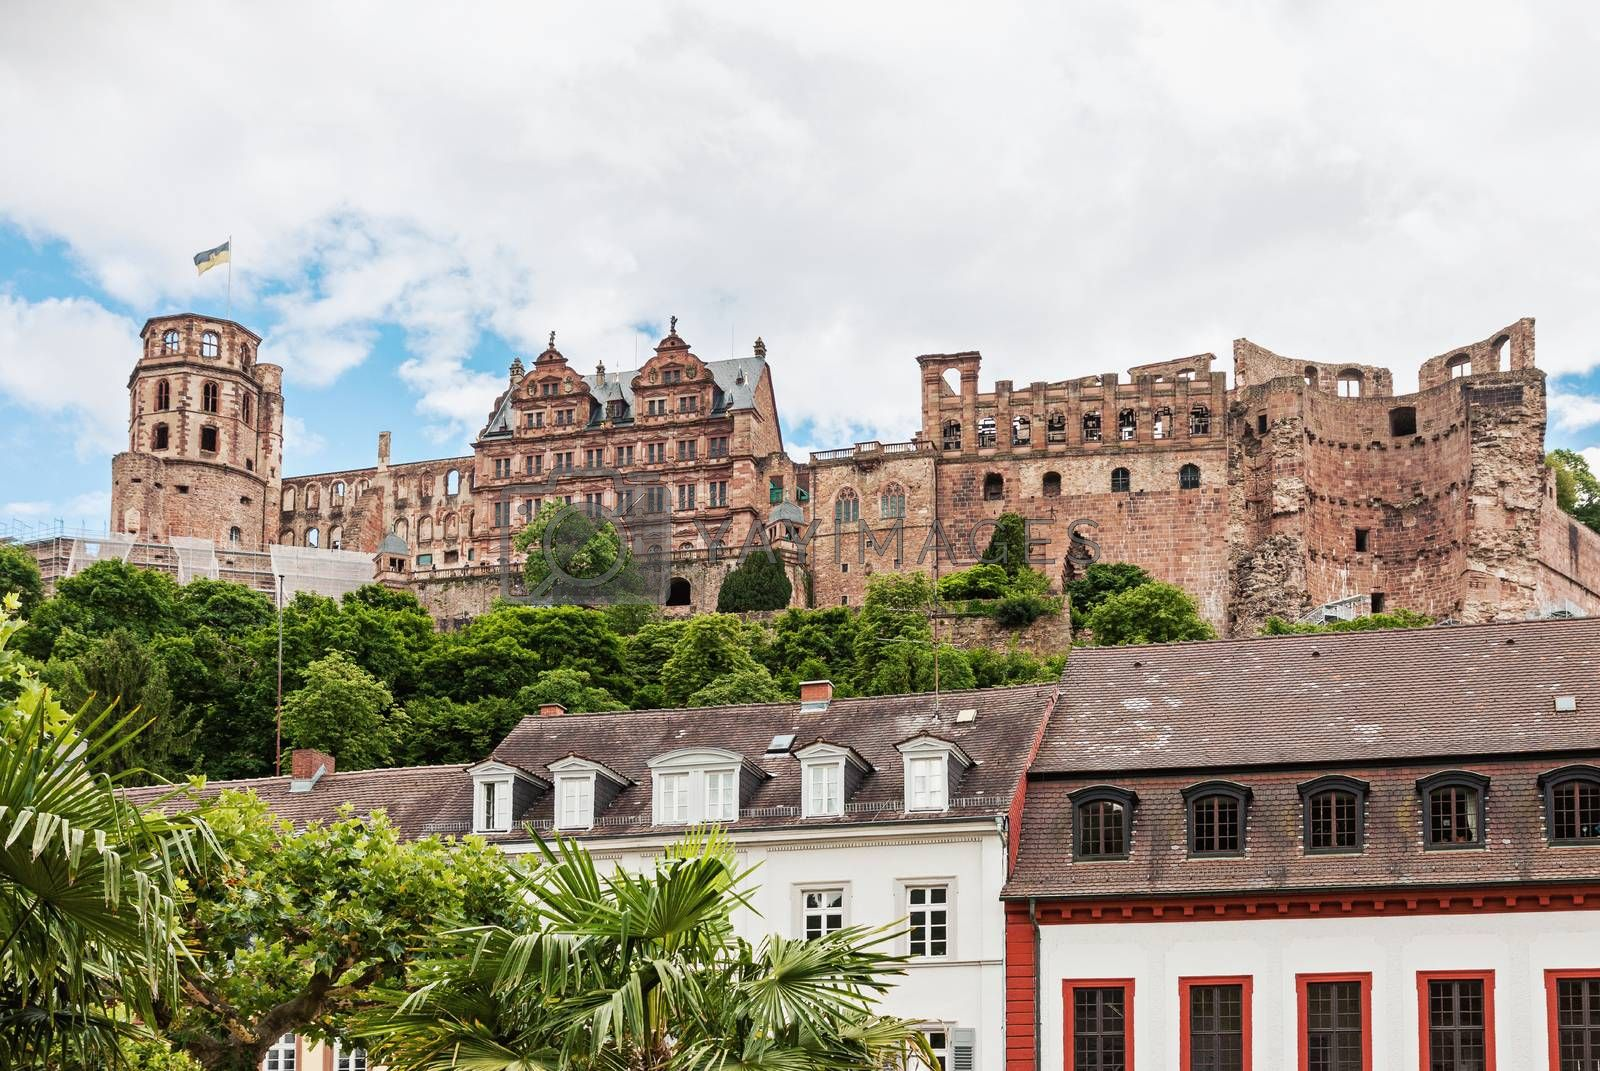 Renaissance Heidelberg castle on the hillside overlooking Heidelberg town in Germany